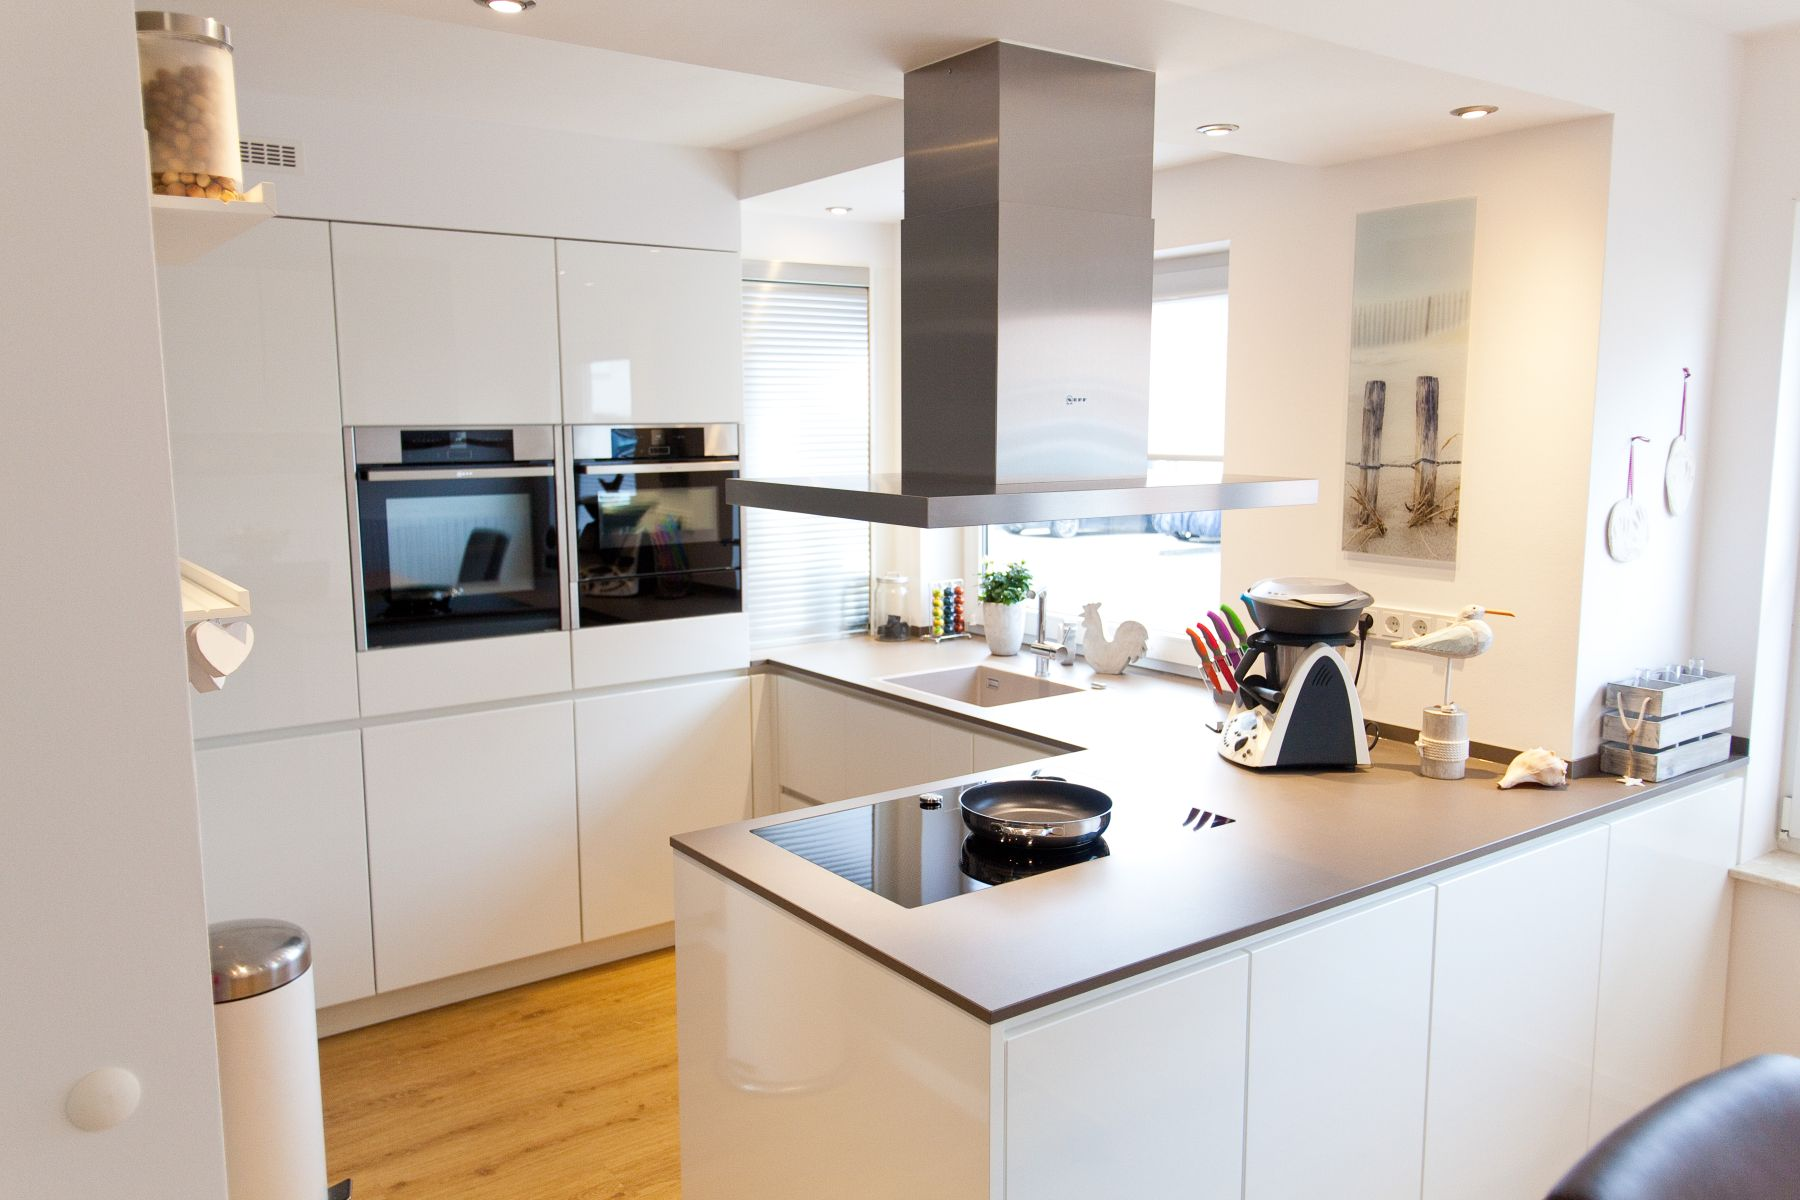 granit arbeitsplatte auf wei er k che im modernen design. Black Bedroom Furniture Sets. Home Design Ideas